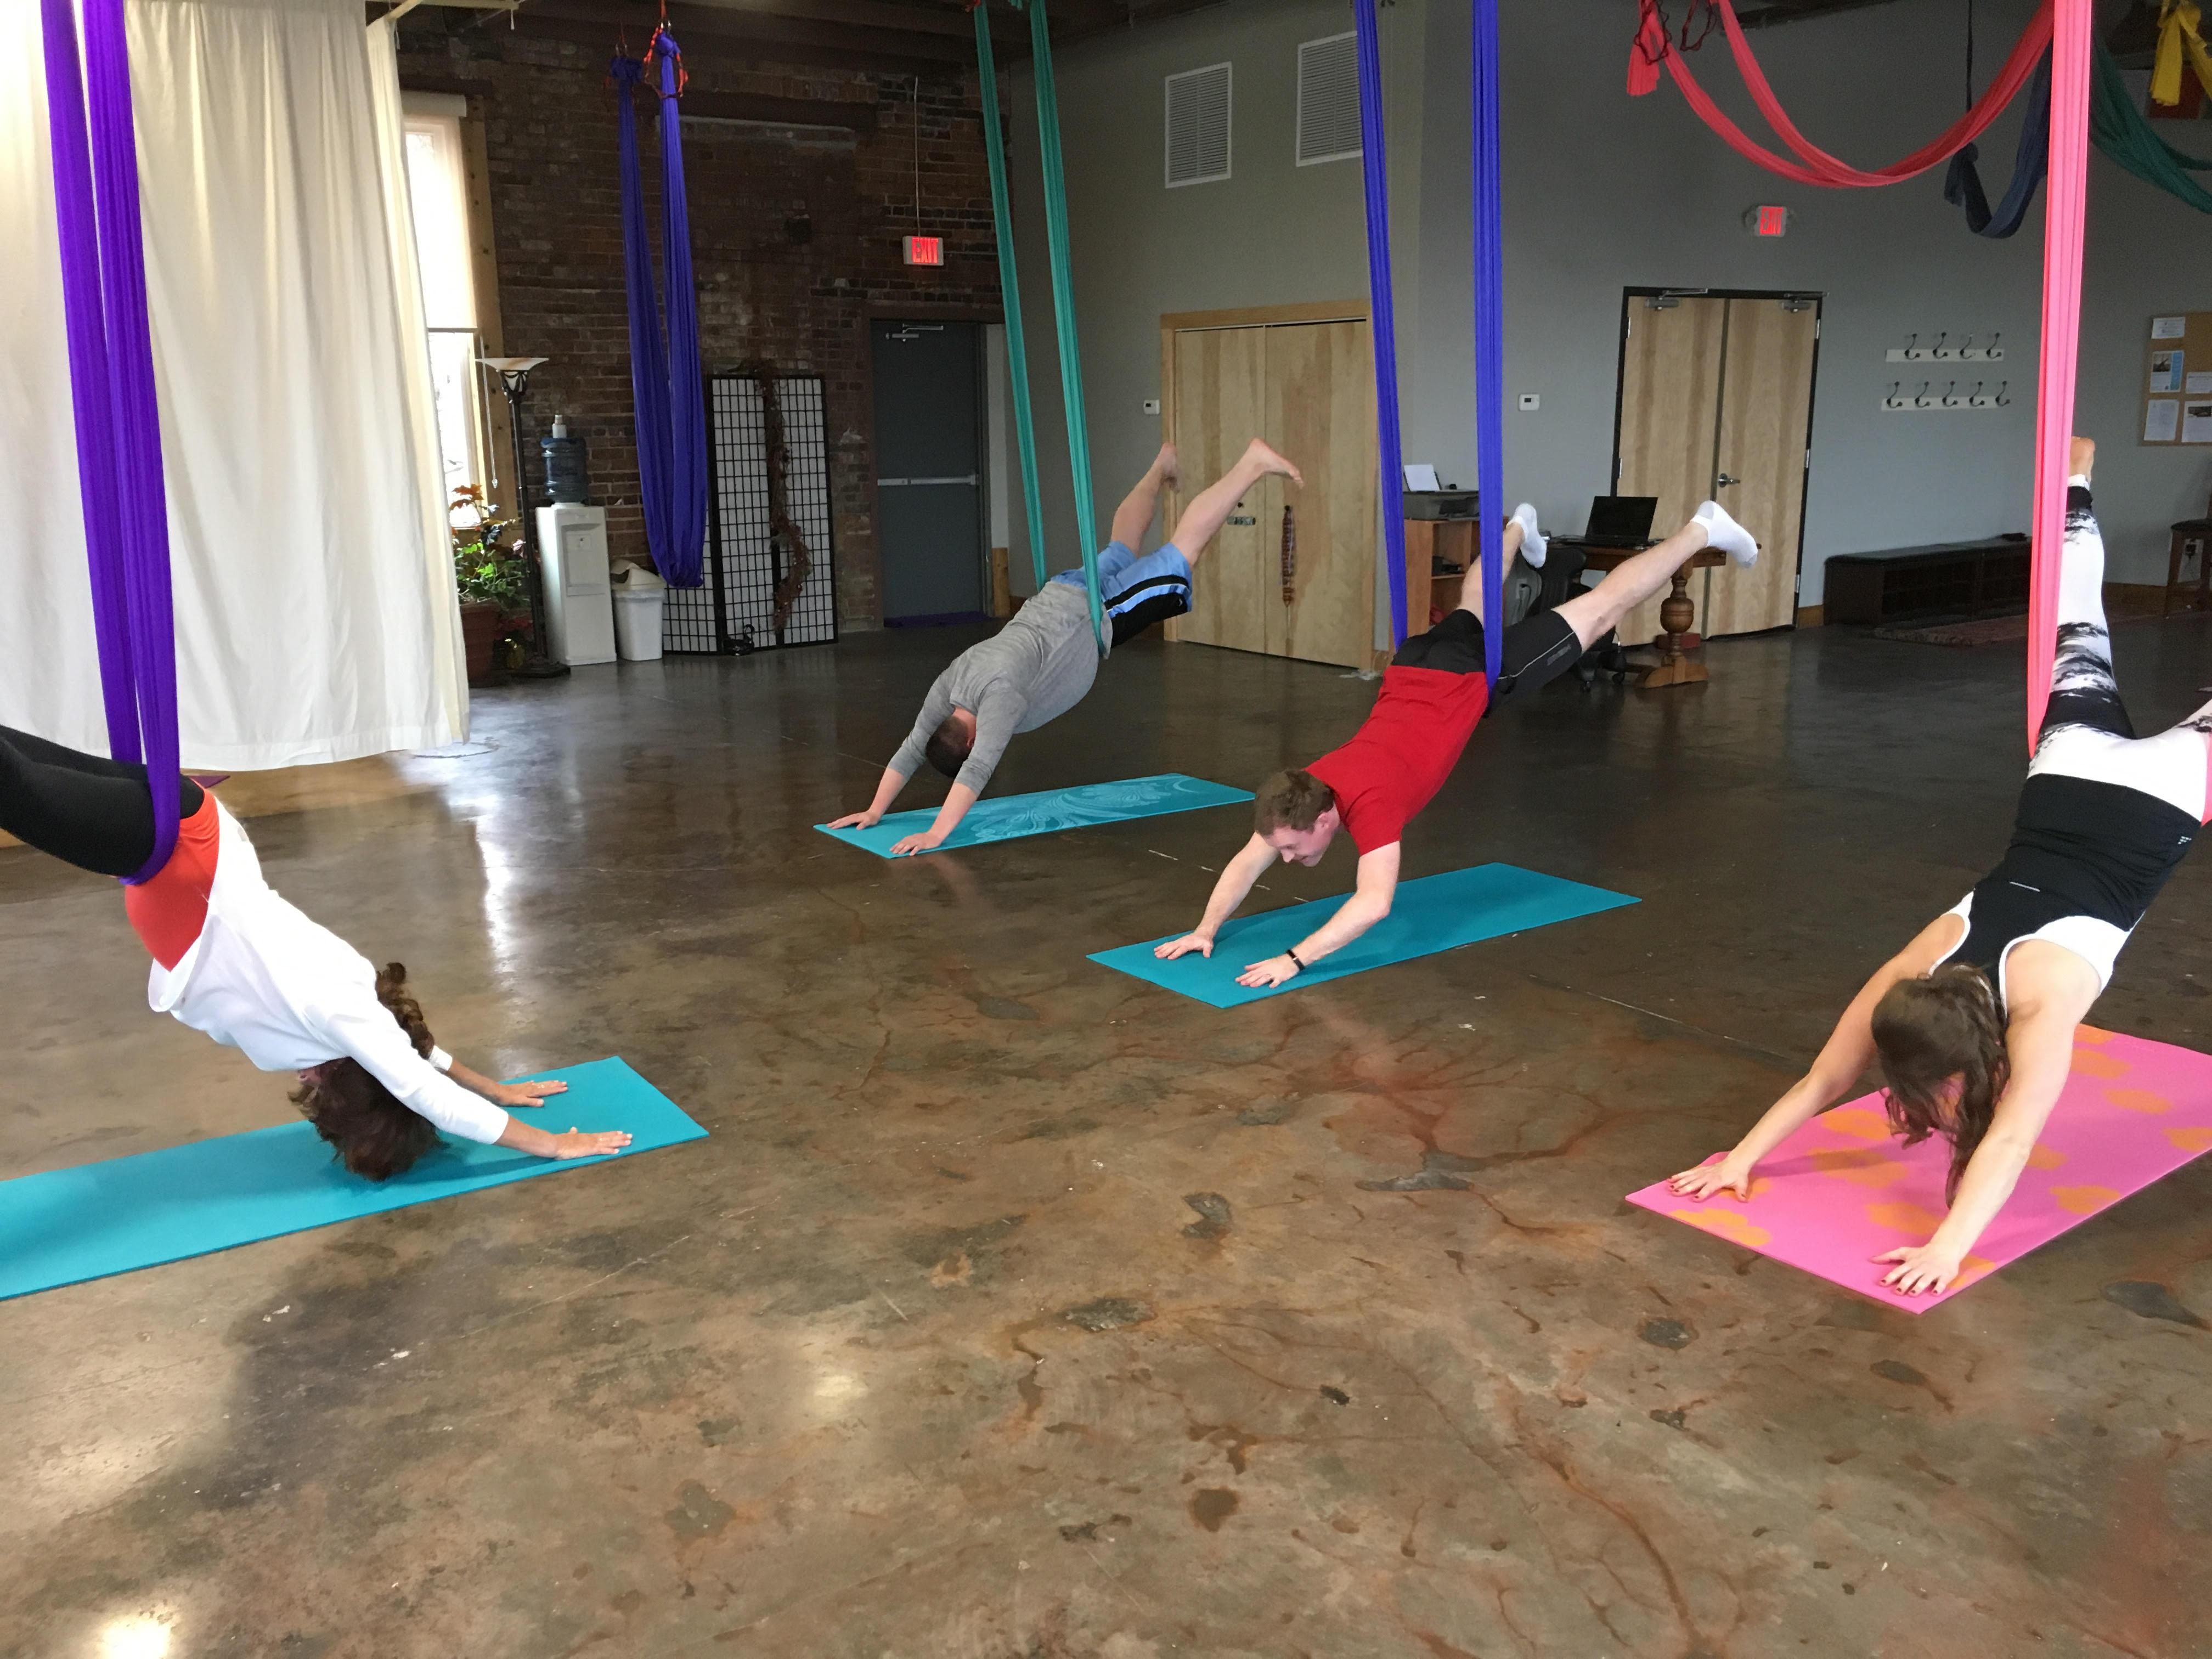 Morning Team Learns Aerial Yoga